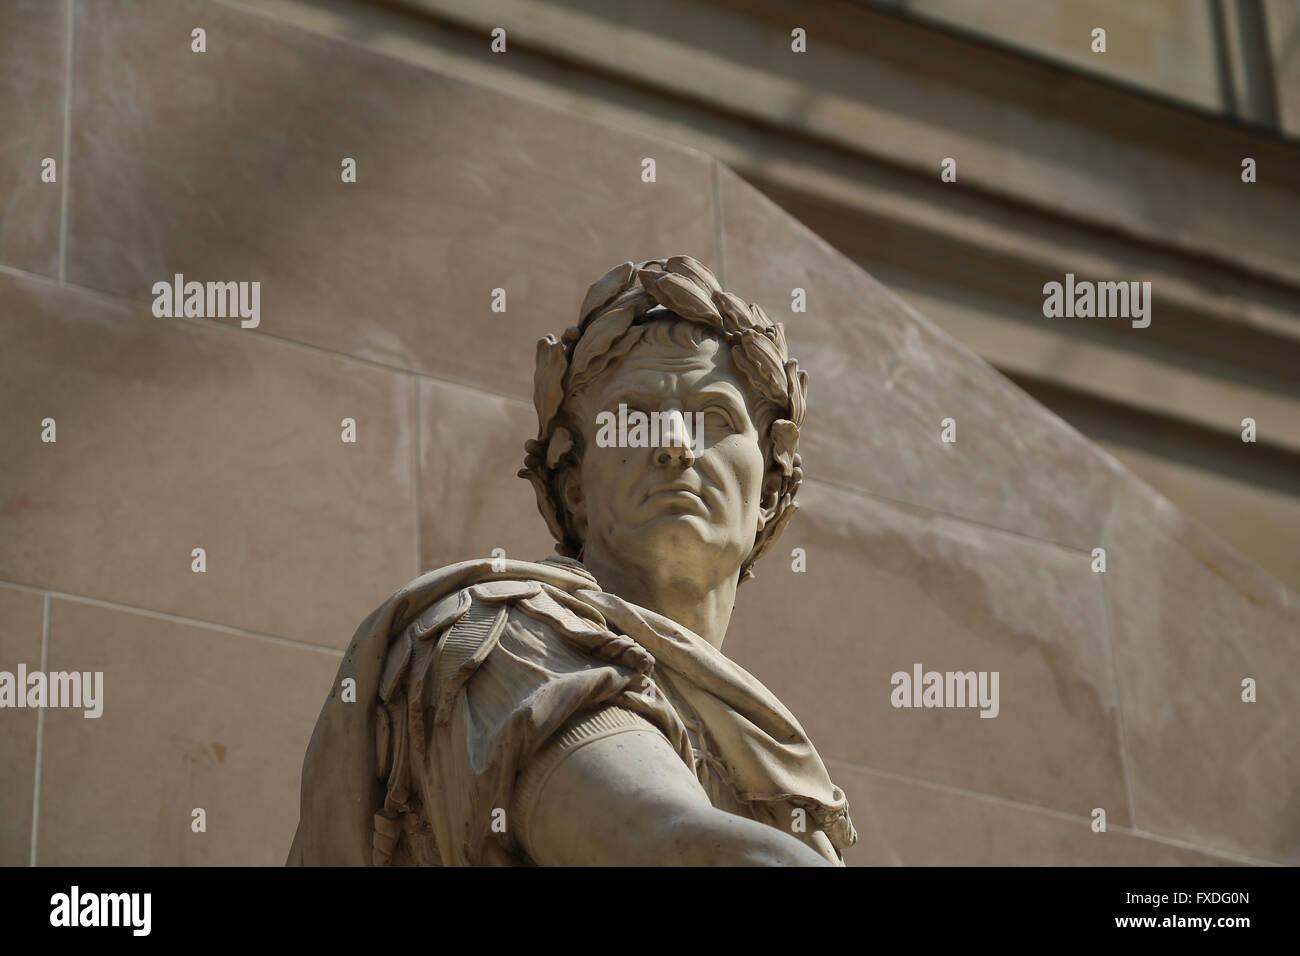 Julius Caesar (100BC-44BC). Roman statesman. Consul and dictador. Sculpture by French artist Nicolas Coustou (1658 - Stock Image